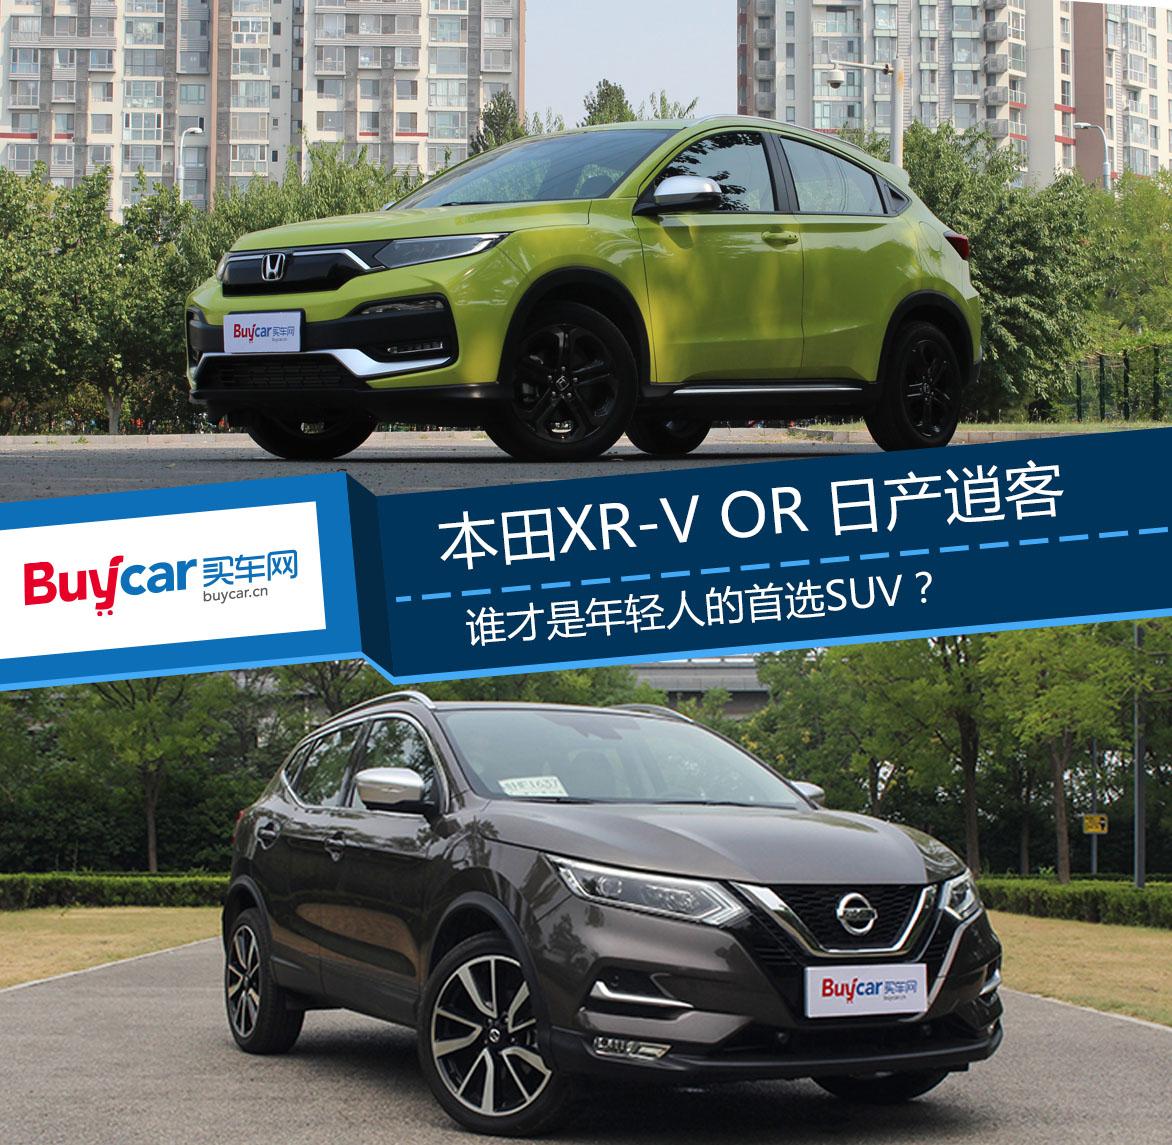 XR-V还是逍客 谁才是年轻人首选SUV?